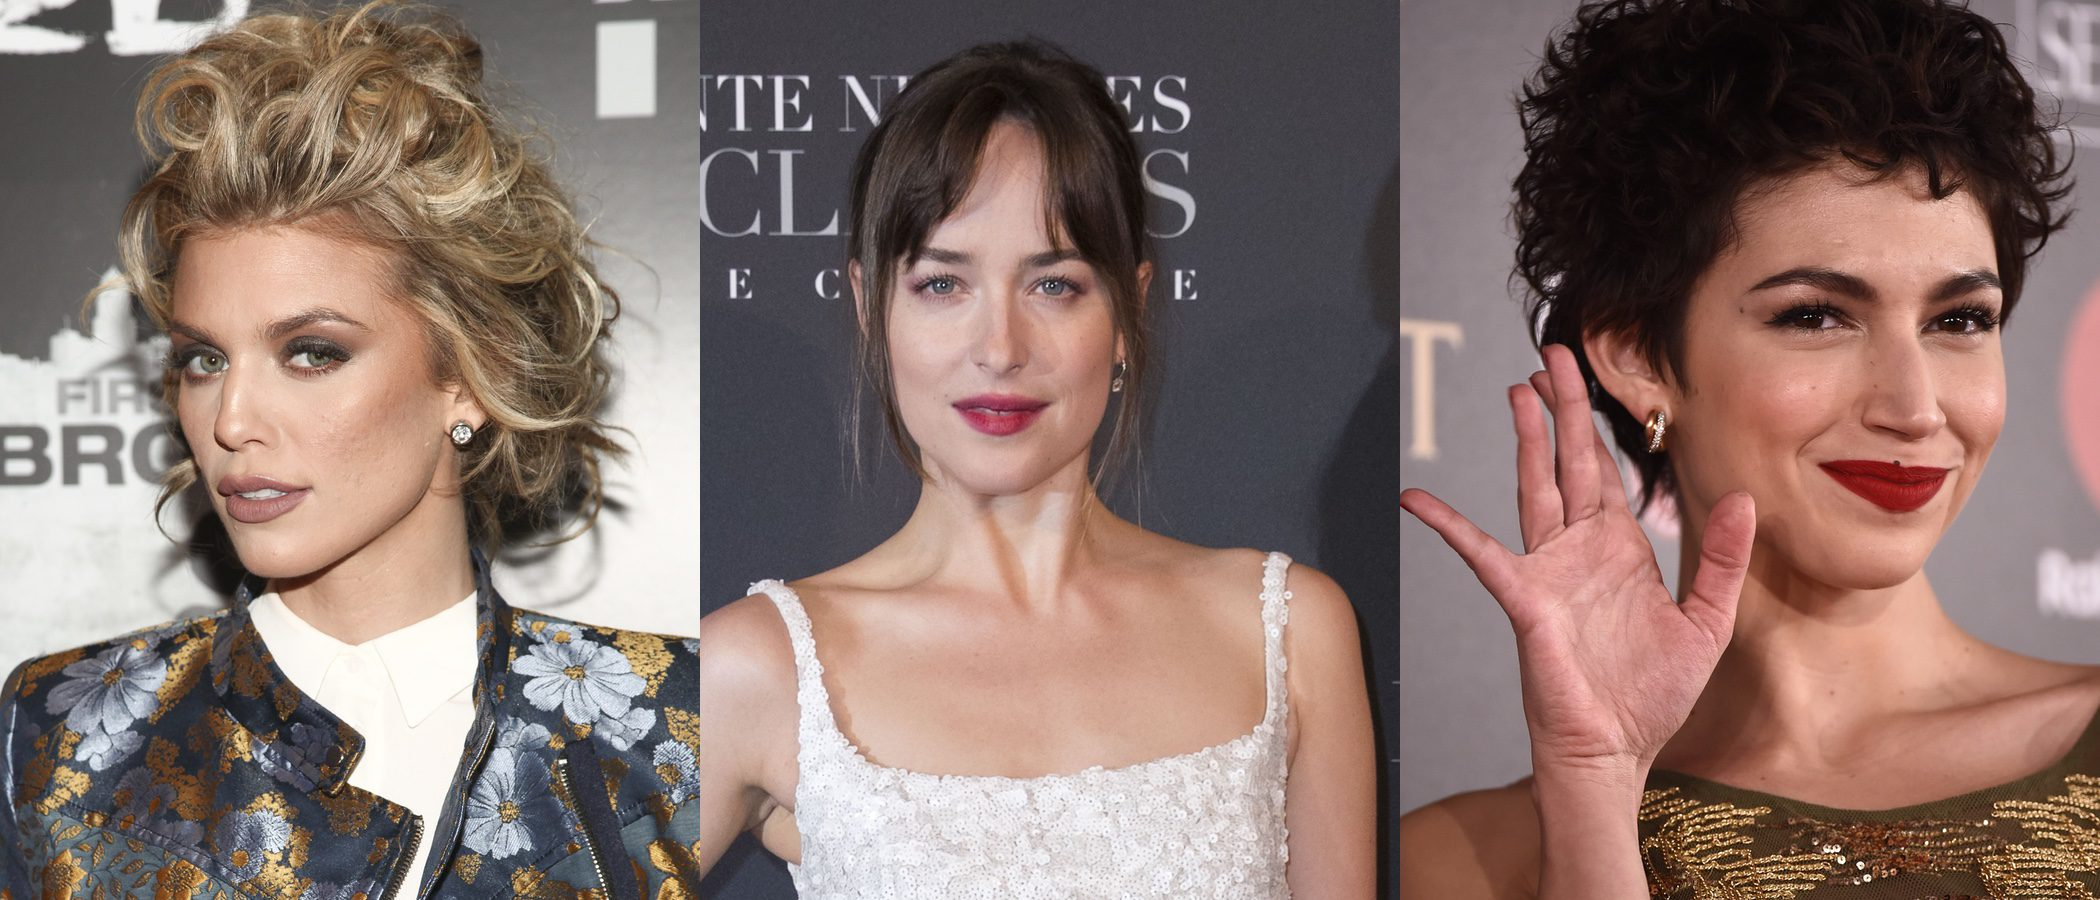 AnnaLynne McCord, Úrsula Corberó y Dakota Johnson, entre los peores beauty looks de esta semana